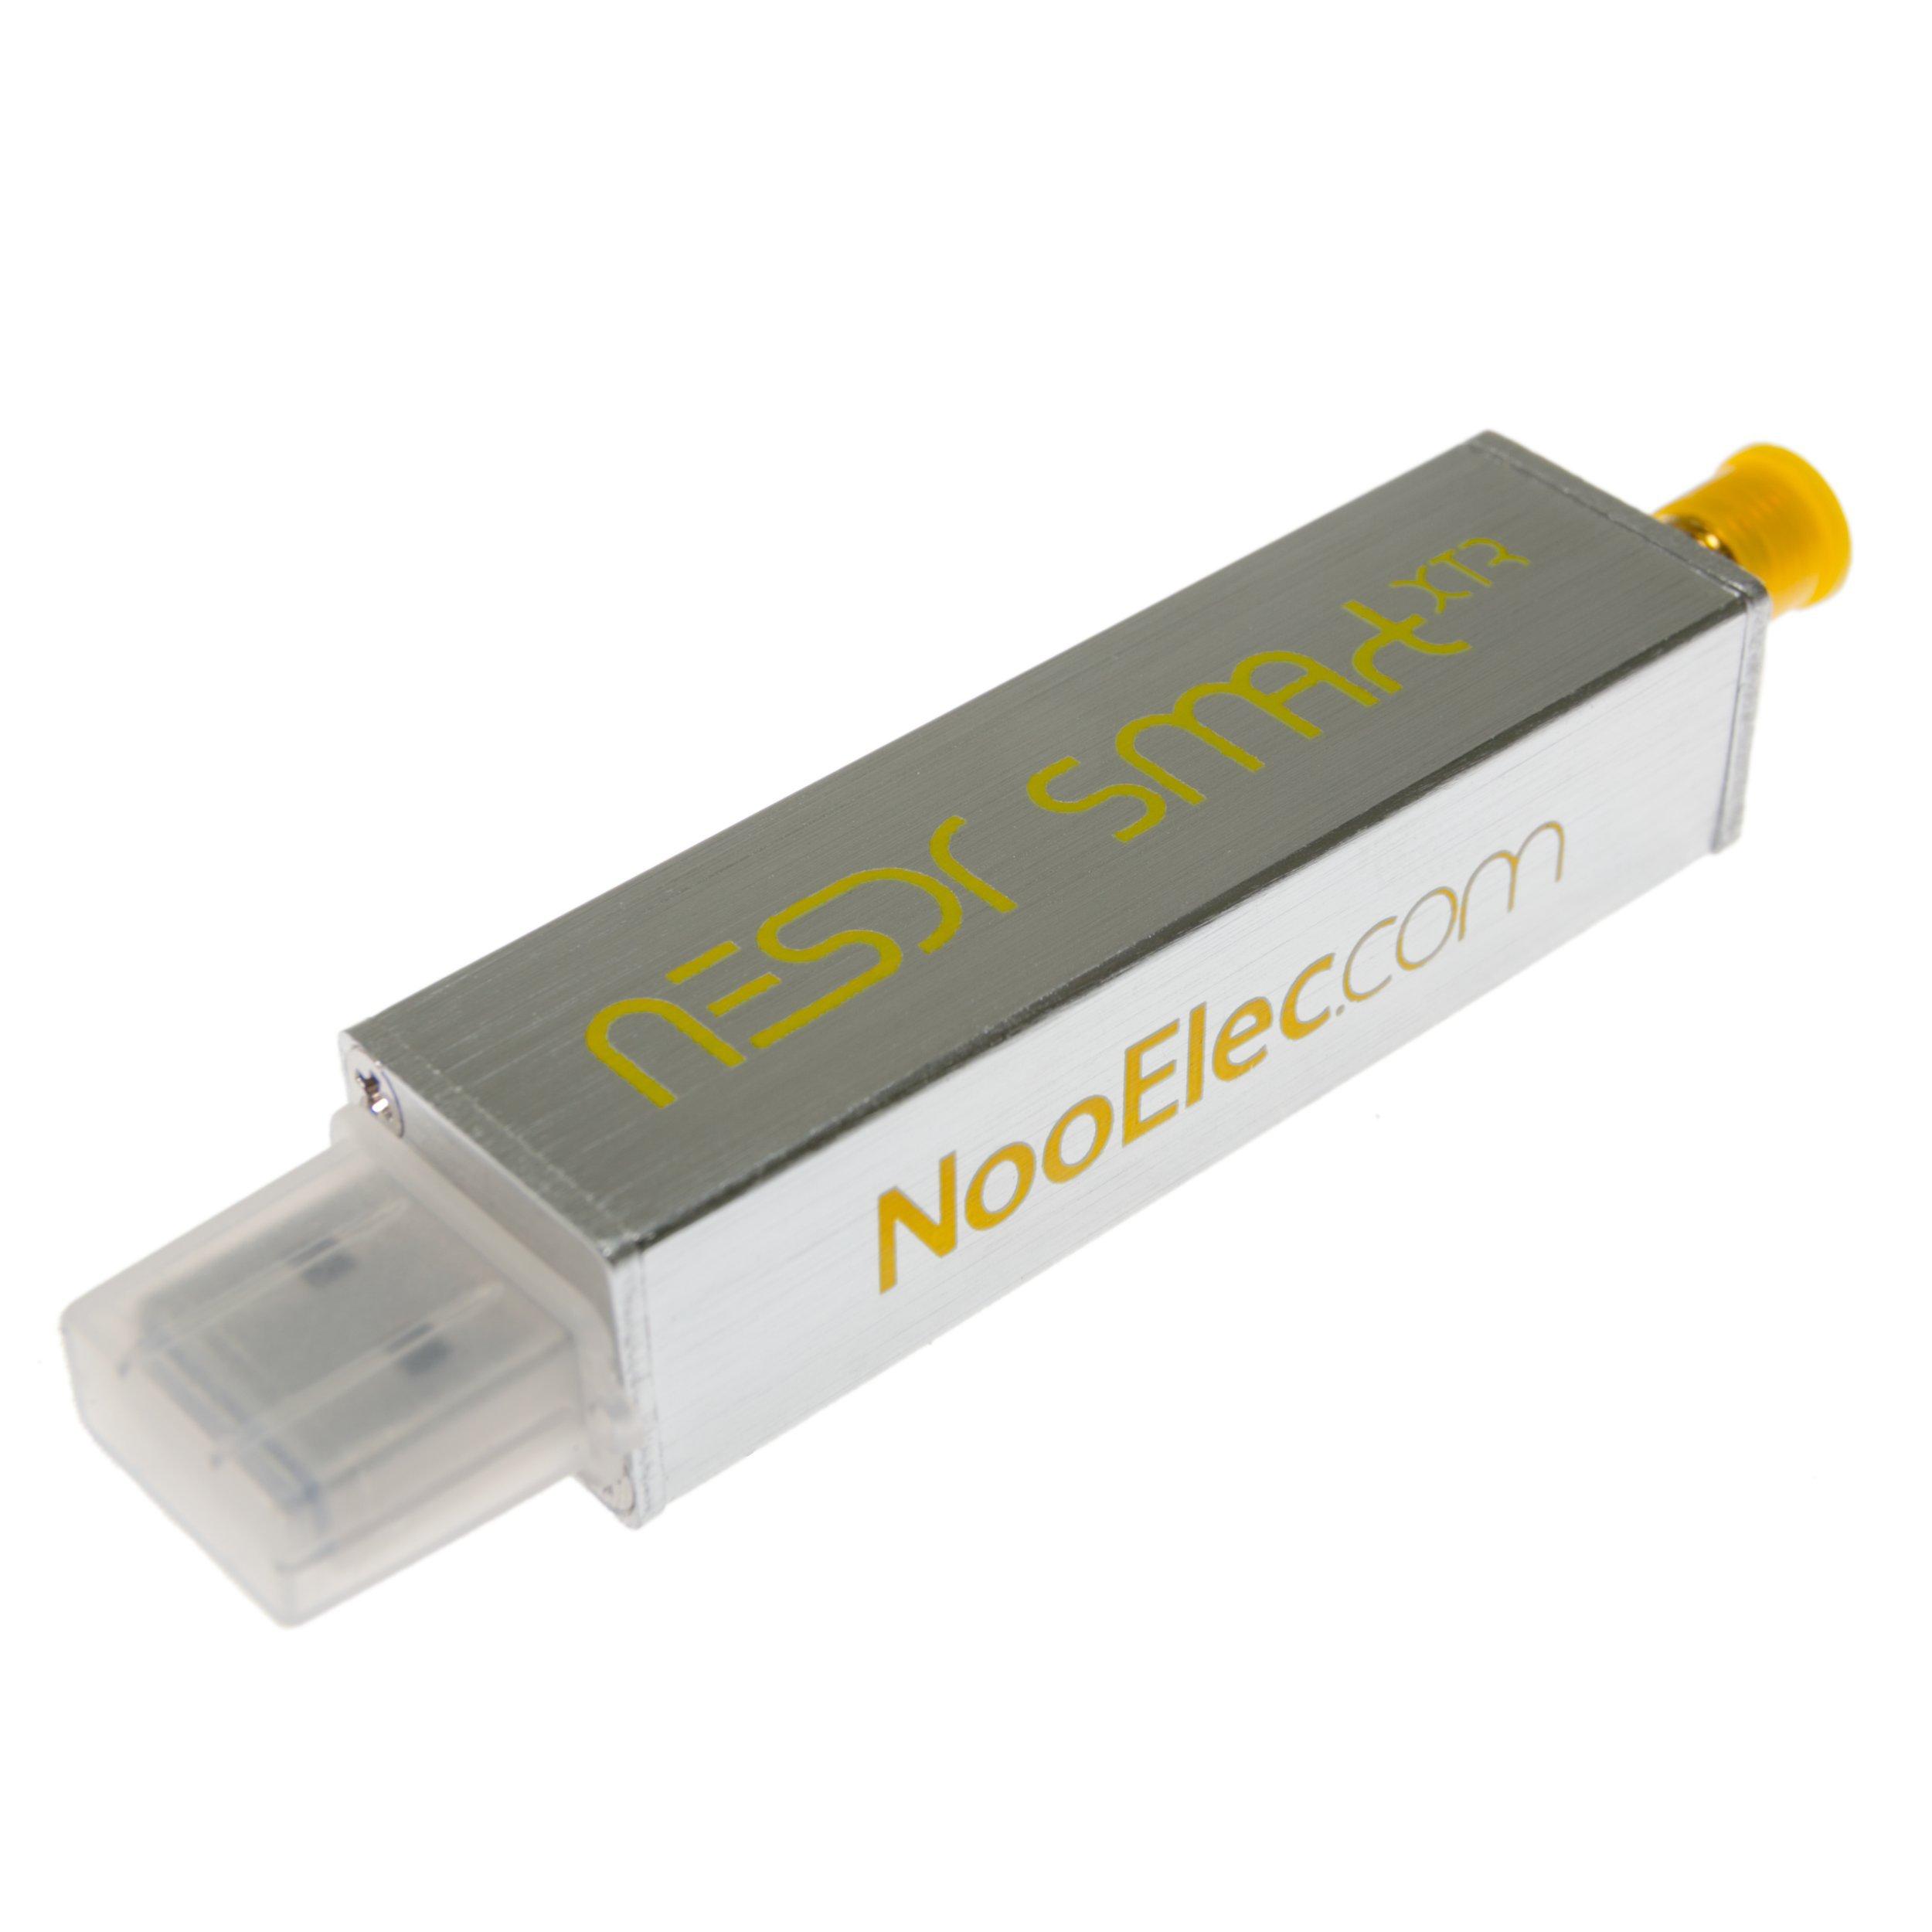 NooElec NESDR SMArt XTR SDR - Premium RTL-SDR w/Extended Tuning Range, Aluminum Enclosure, 0.5PPM TCXO, SMA Input. RTL2832U & E4000-Based Software Defined Radio